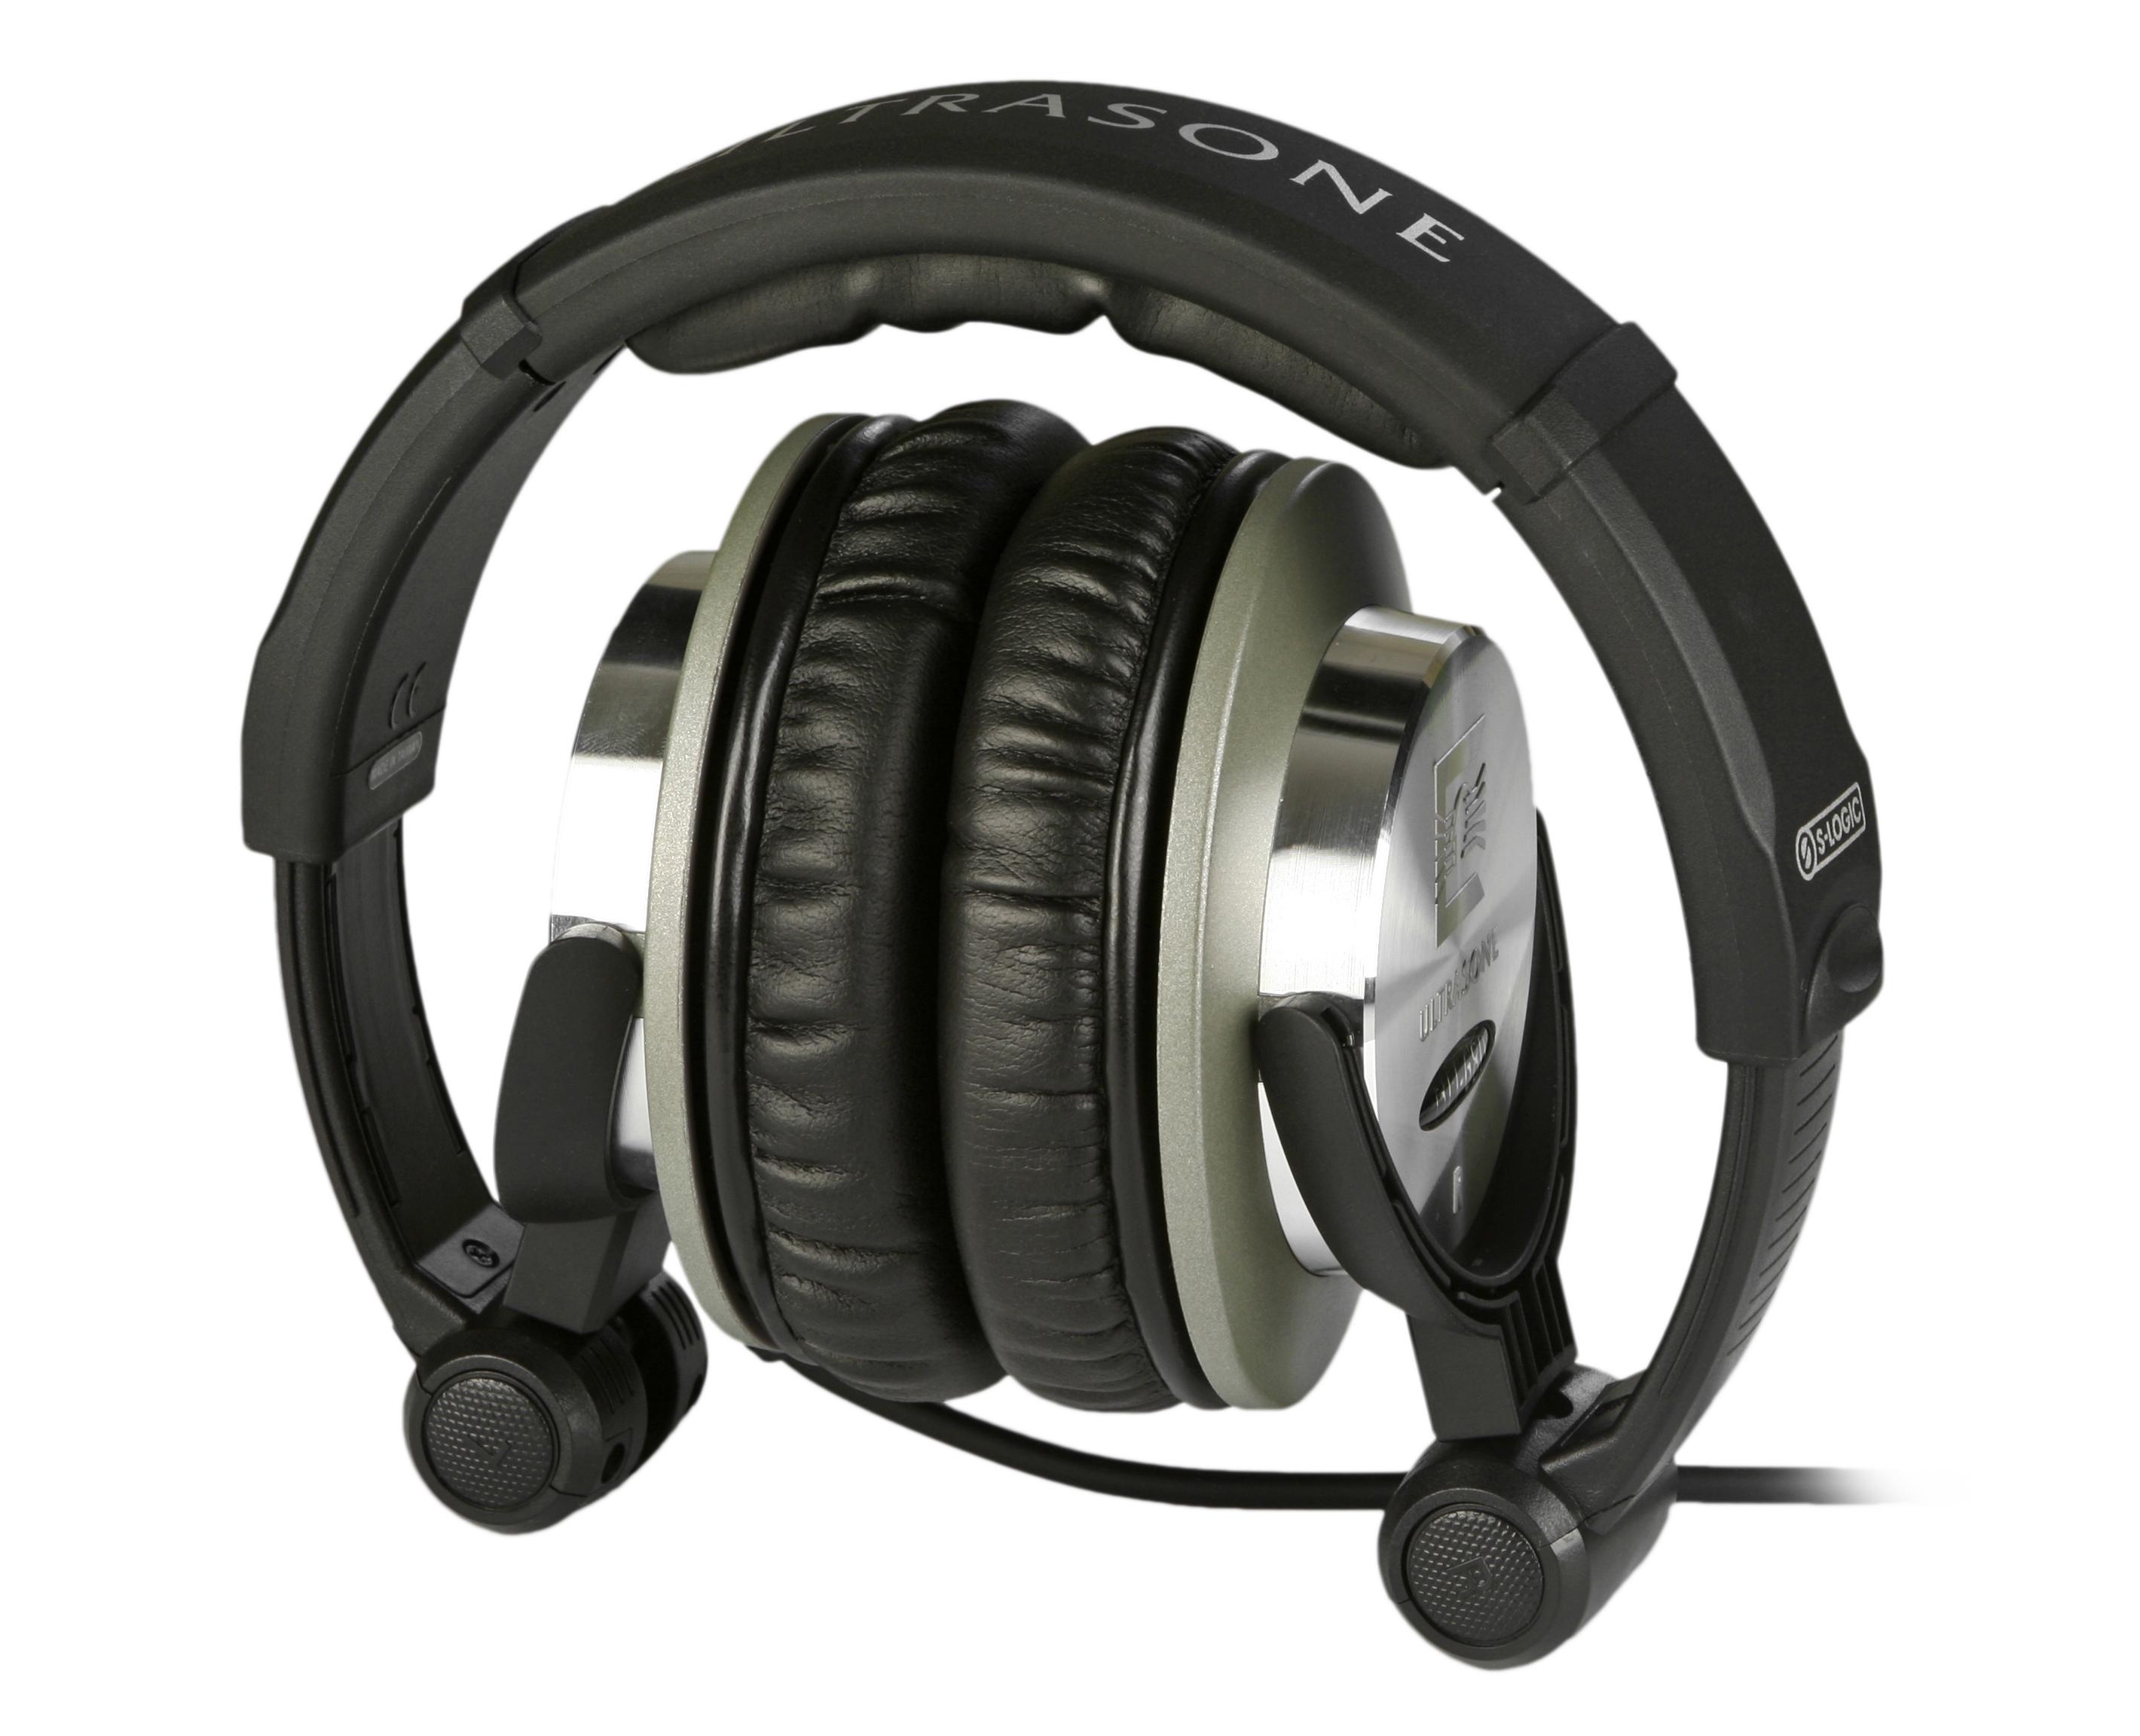 Ultrasone HFI680